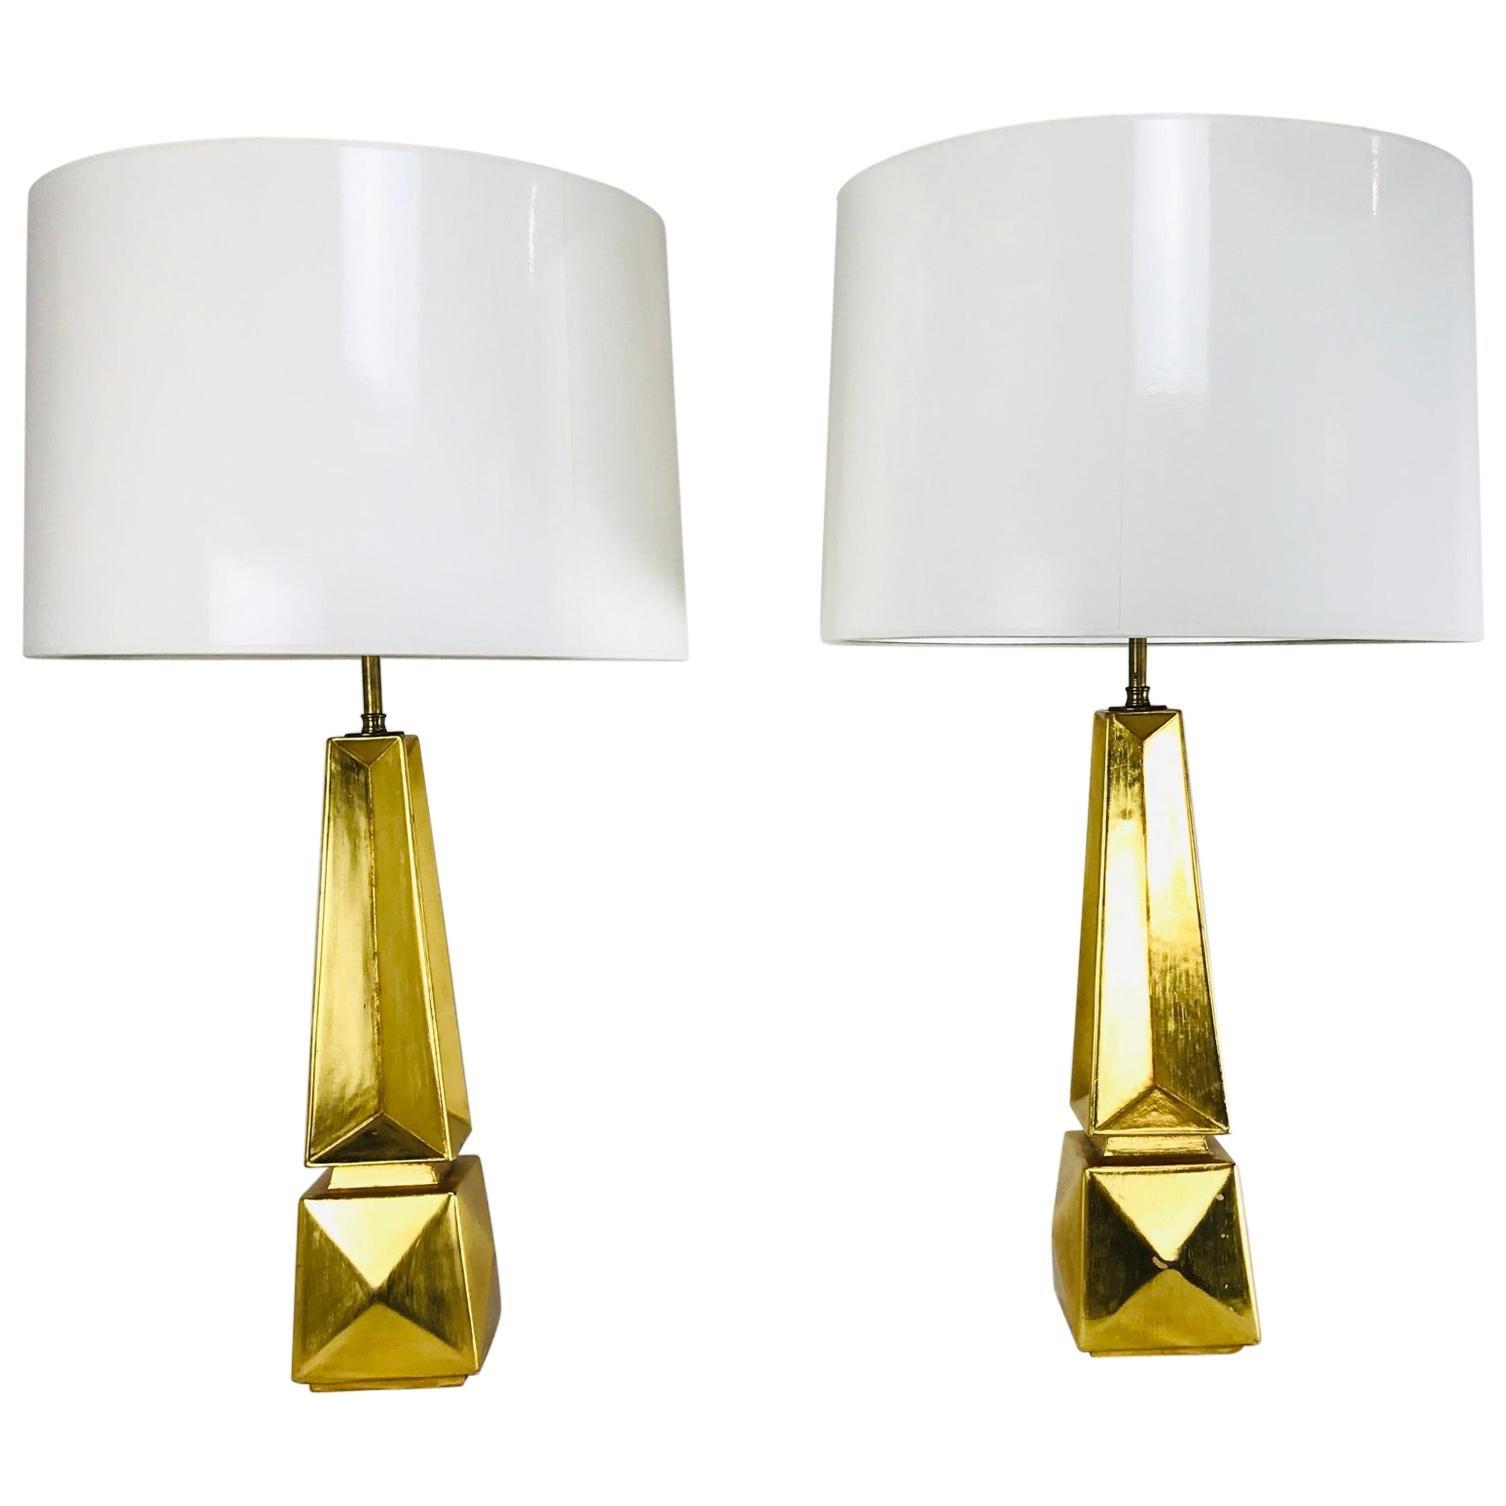 Pair of Gold Leaf Obelisk Table Lamps